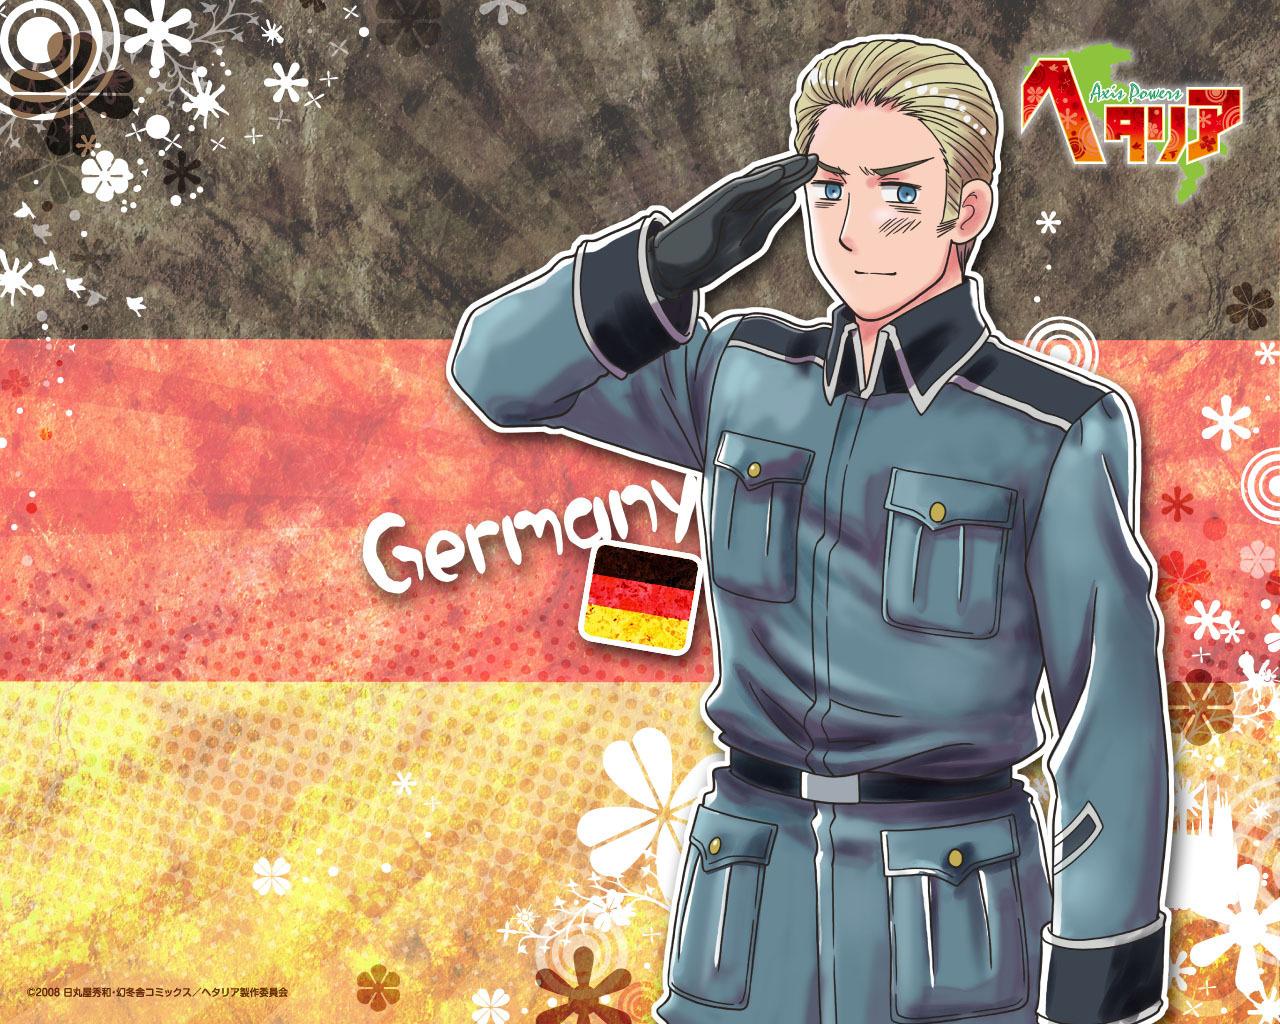 Hetalia Axis Power APH Germany   Hetalia Wallpaper 13892922 1280x1024